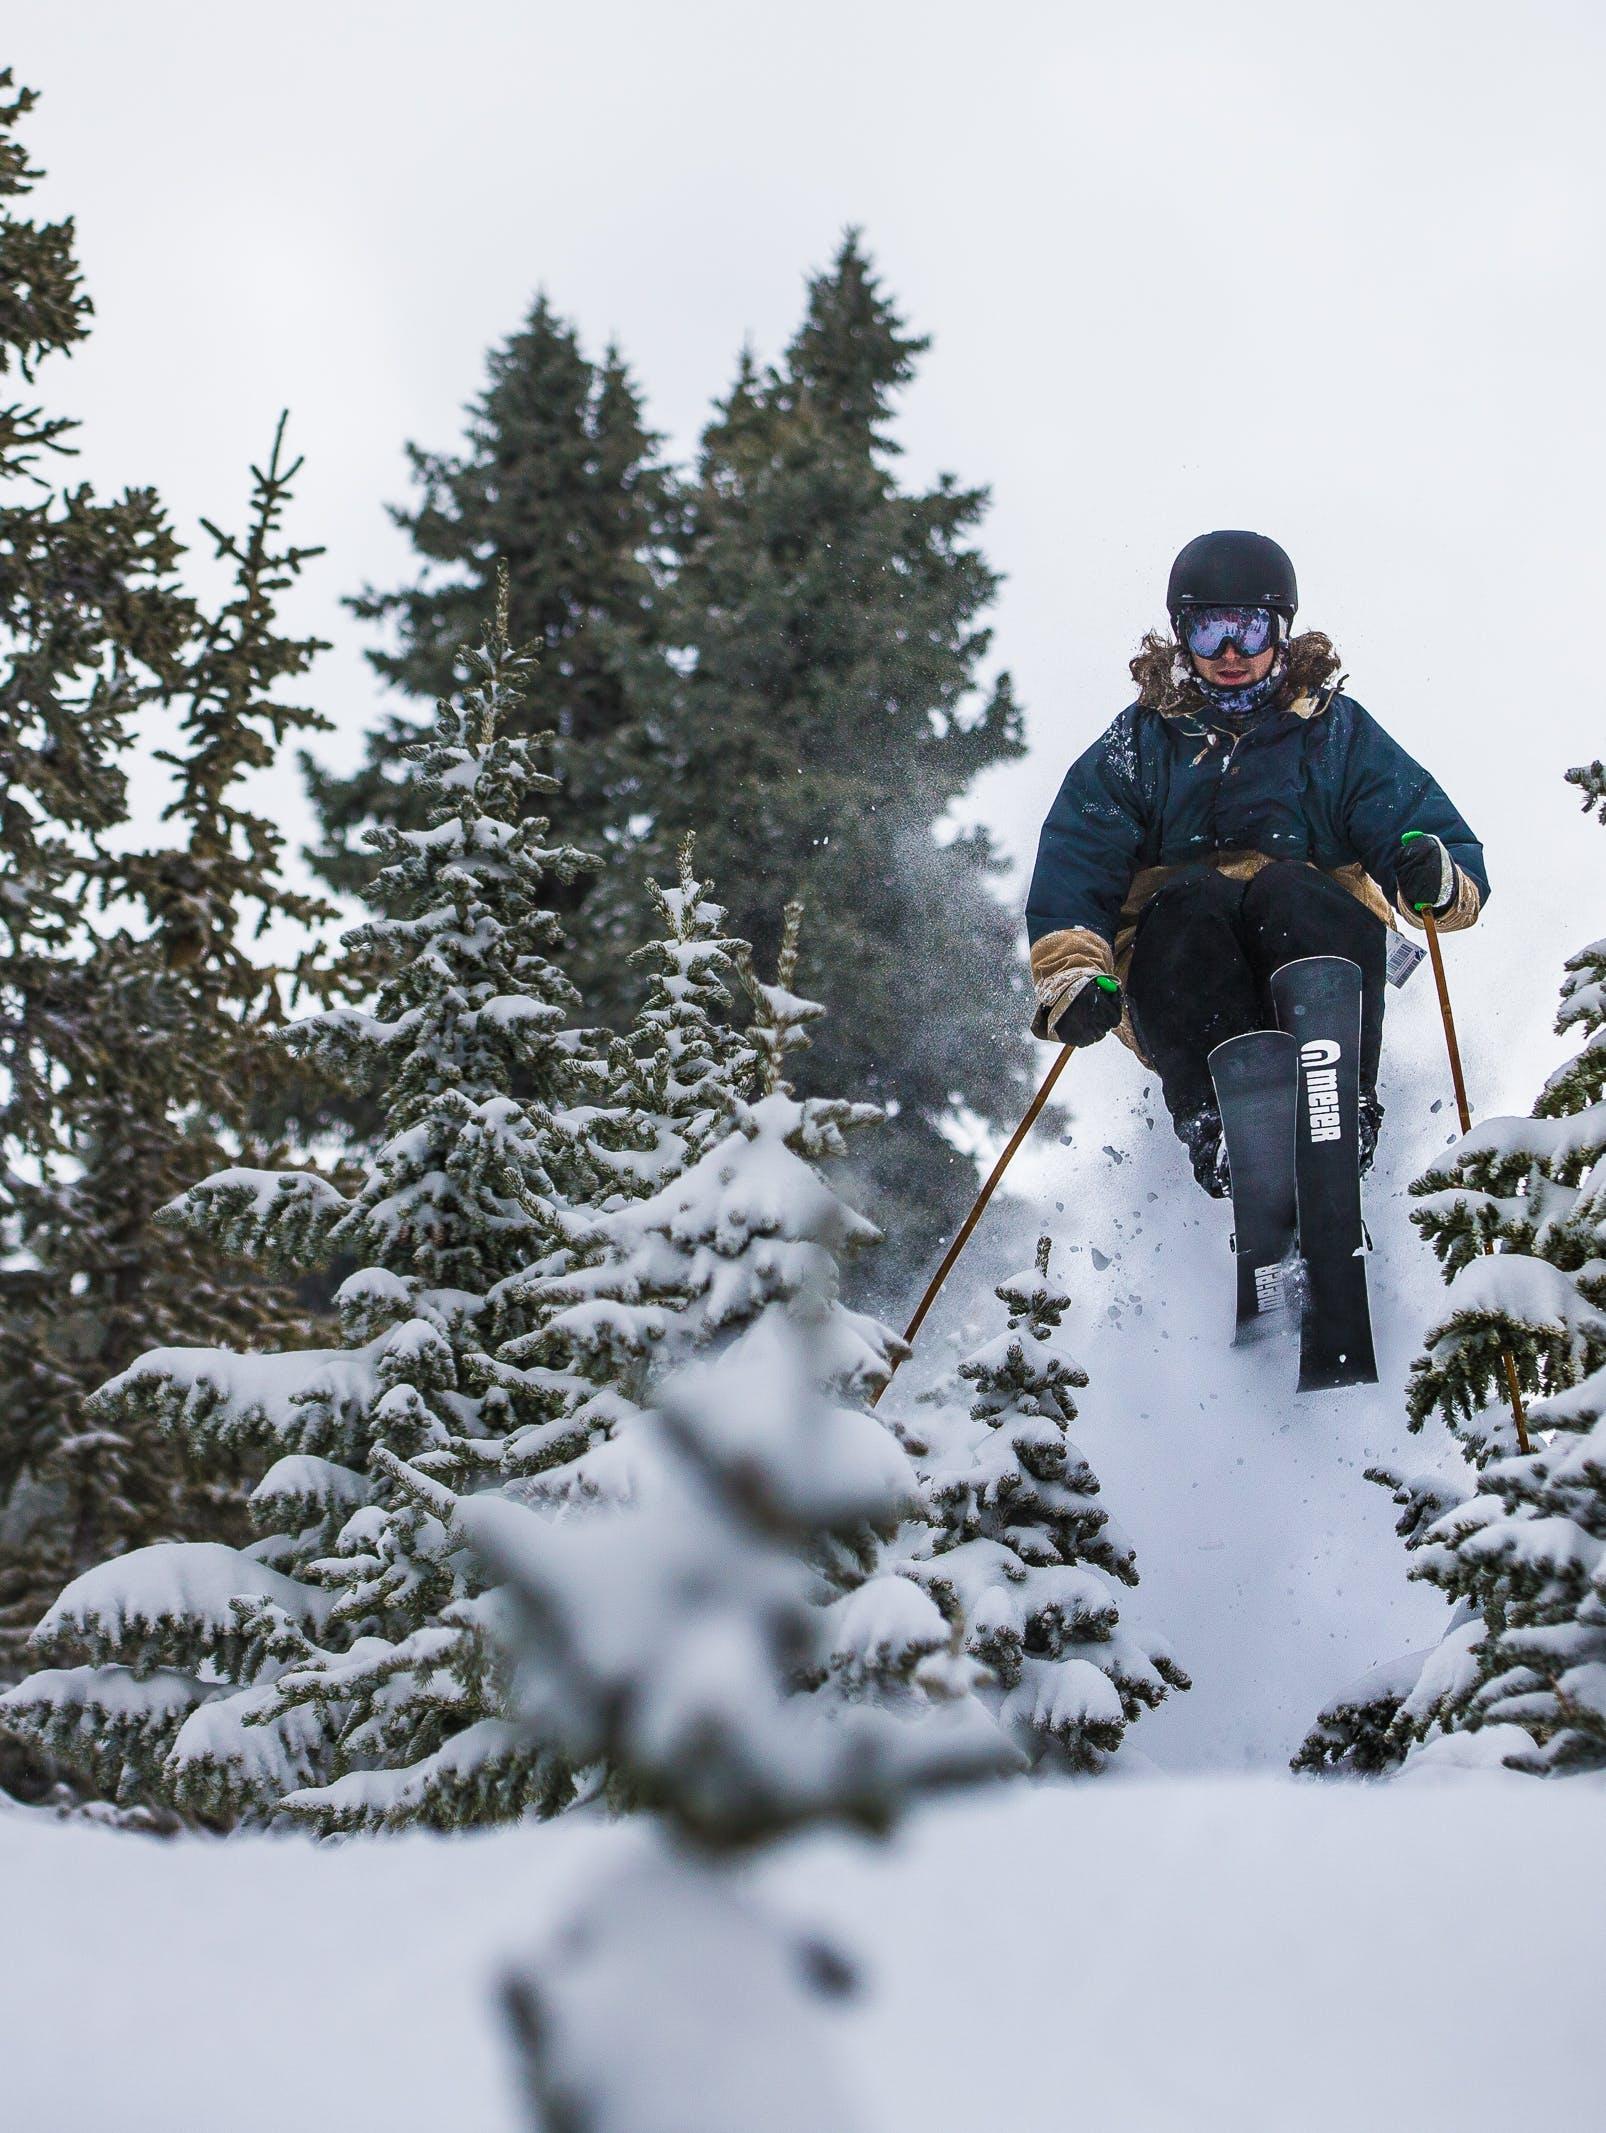 Winter Sports Expert Etienne A.